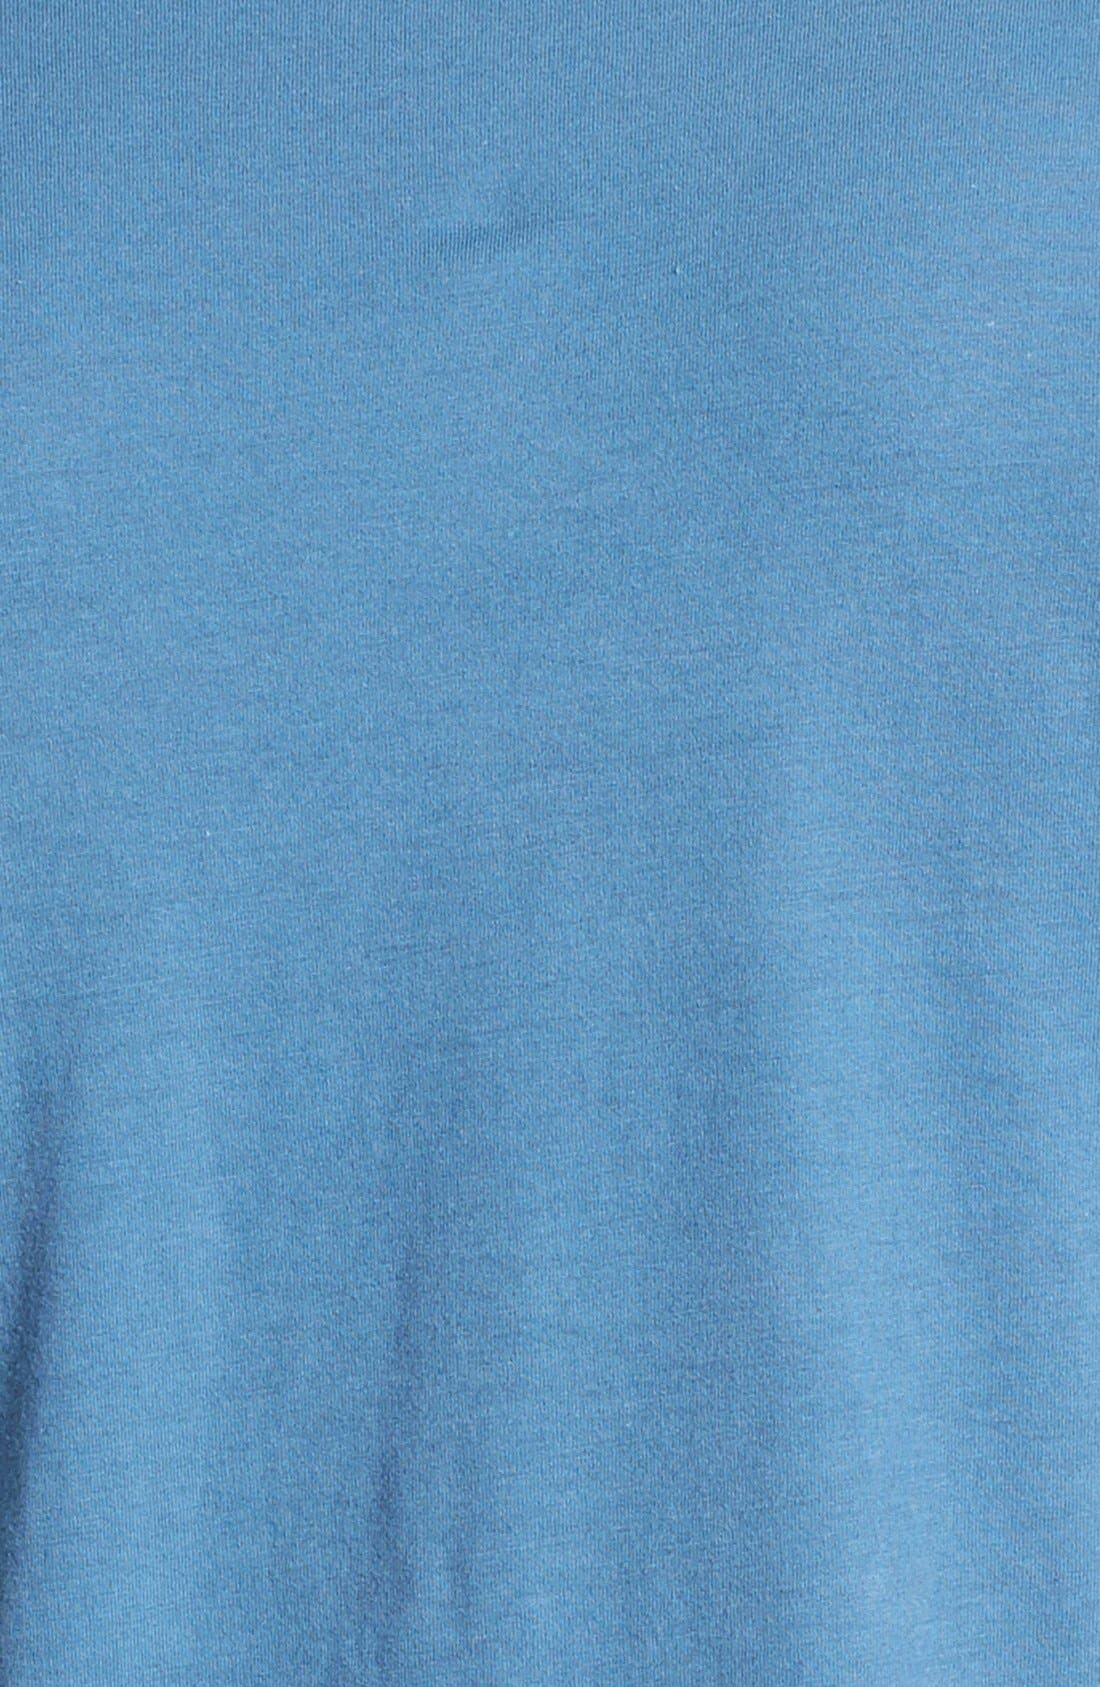 Alternate Image 3  - Retro Brand 'Florida Gators' T-Shirt